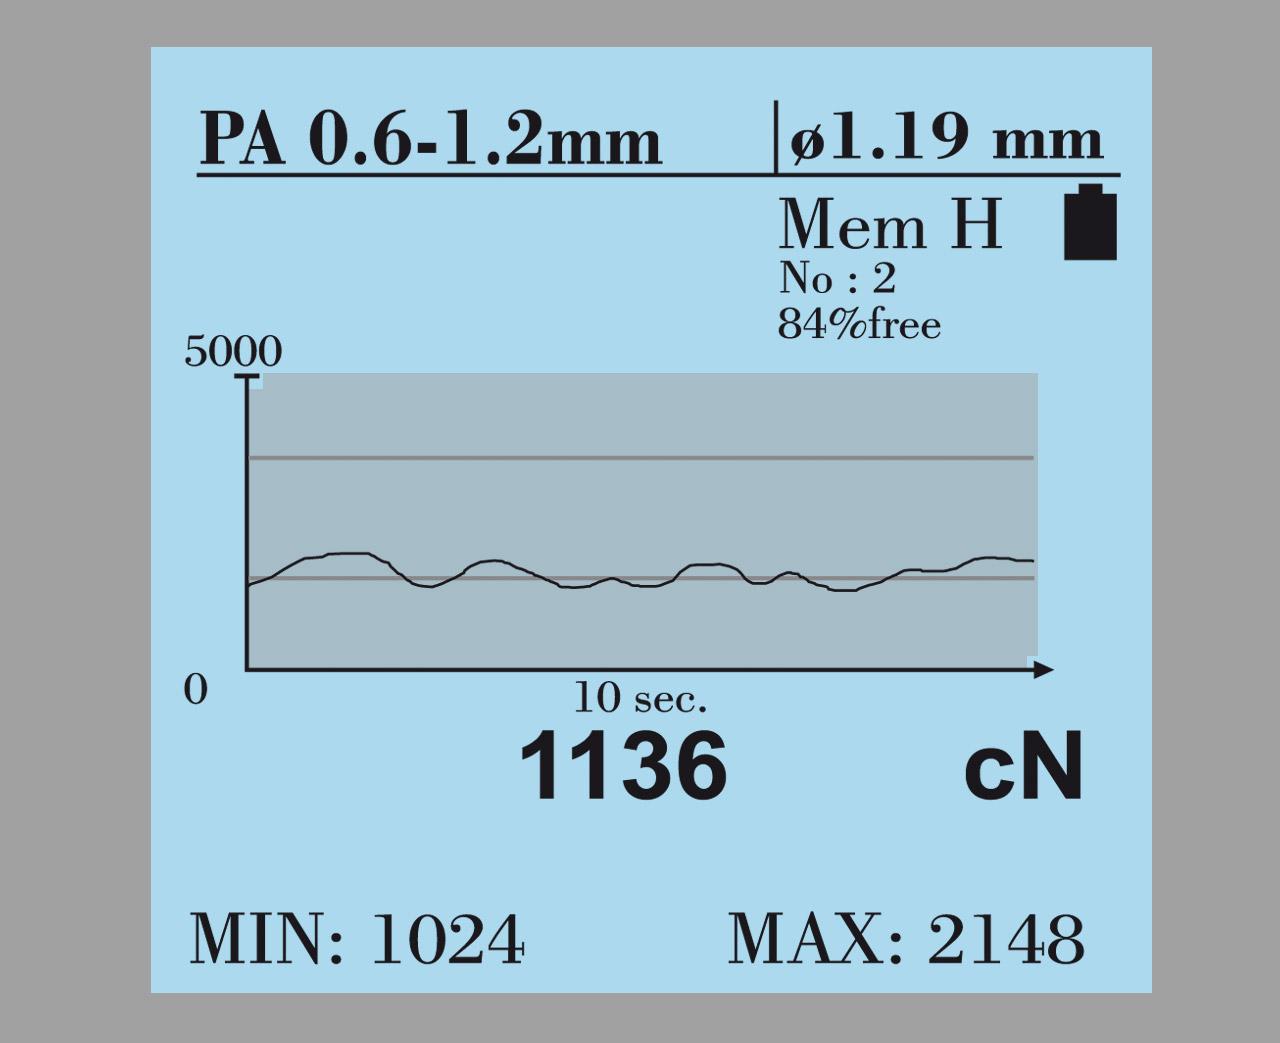 DTX - Data-Logging Digital Tension Meter